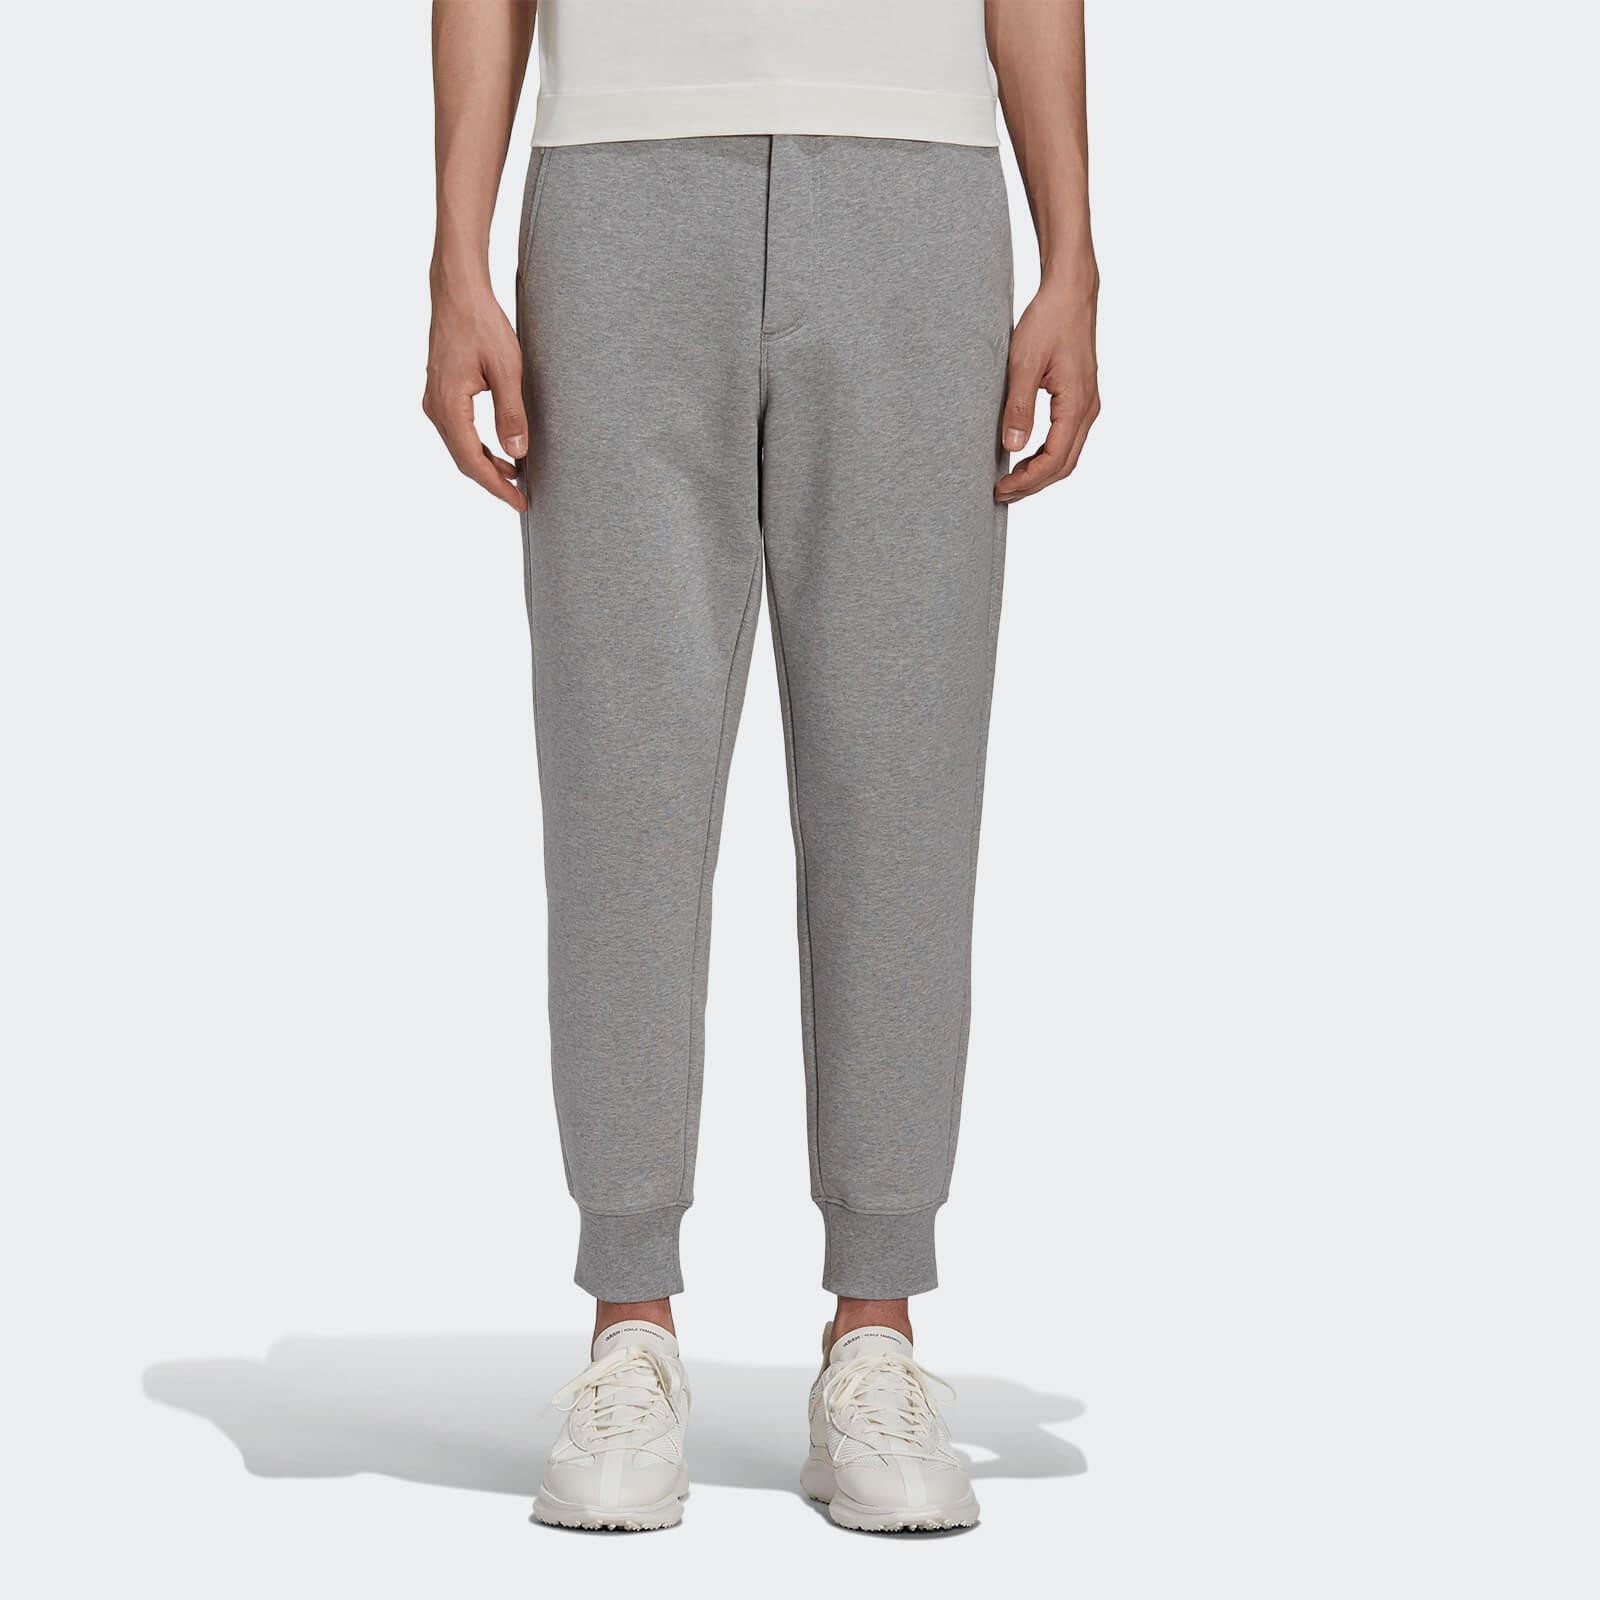 Y-3 Men's Classic Terry Cuffed Pants - Medium Grey Heather - M